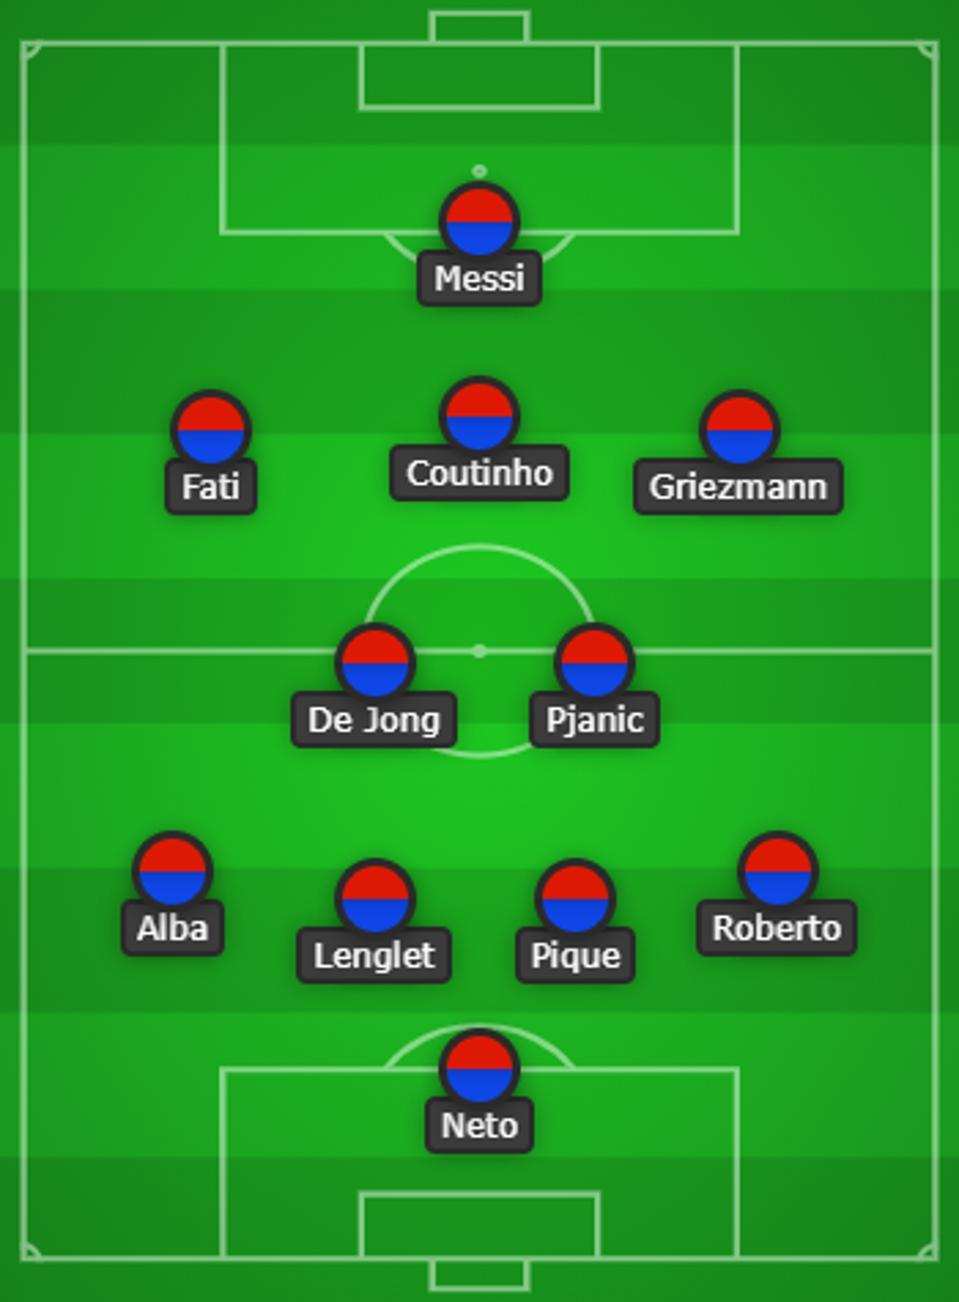 Ronald Koeman should put out this starting lineup for FC Barcelona against Celta Vigo.